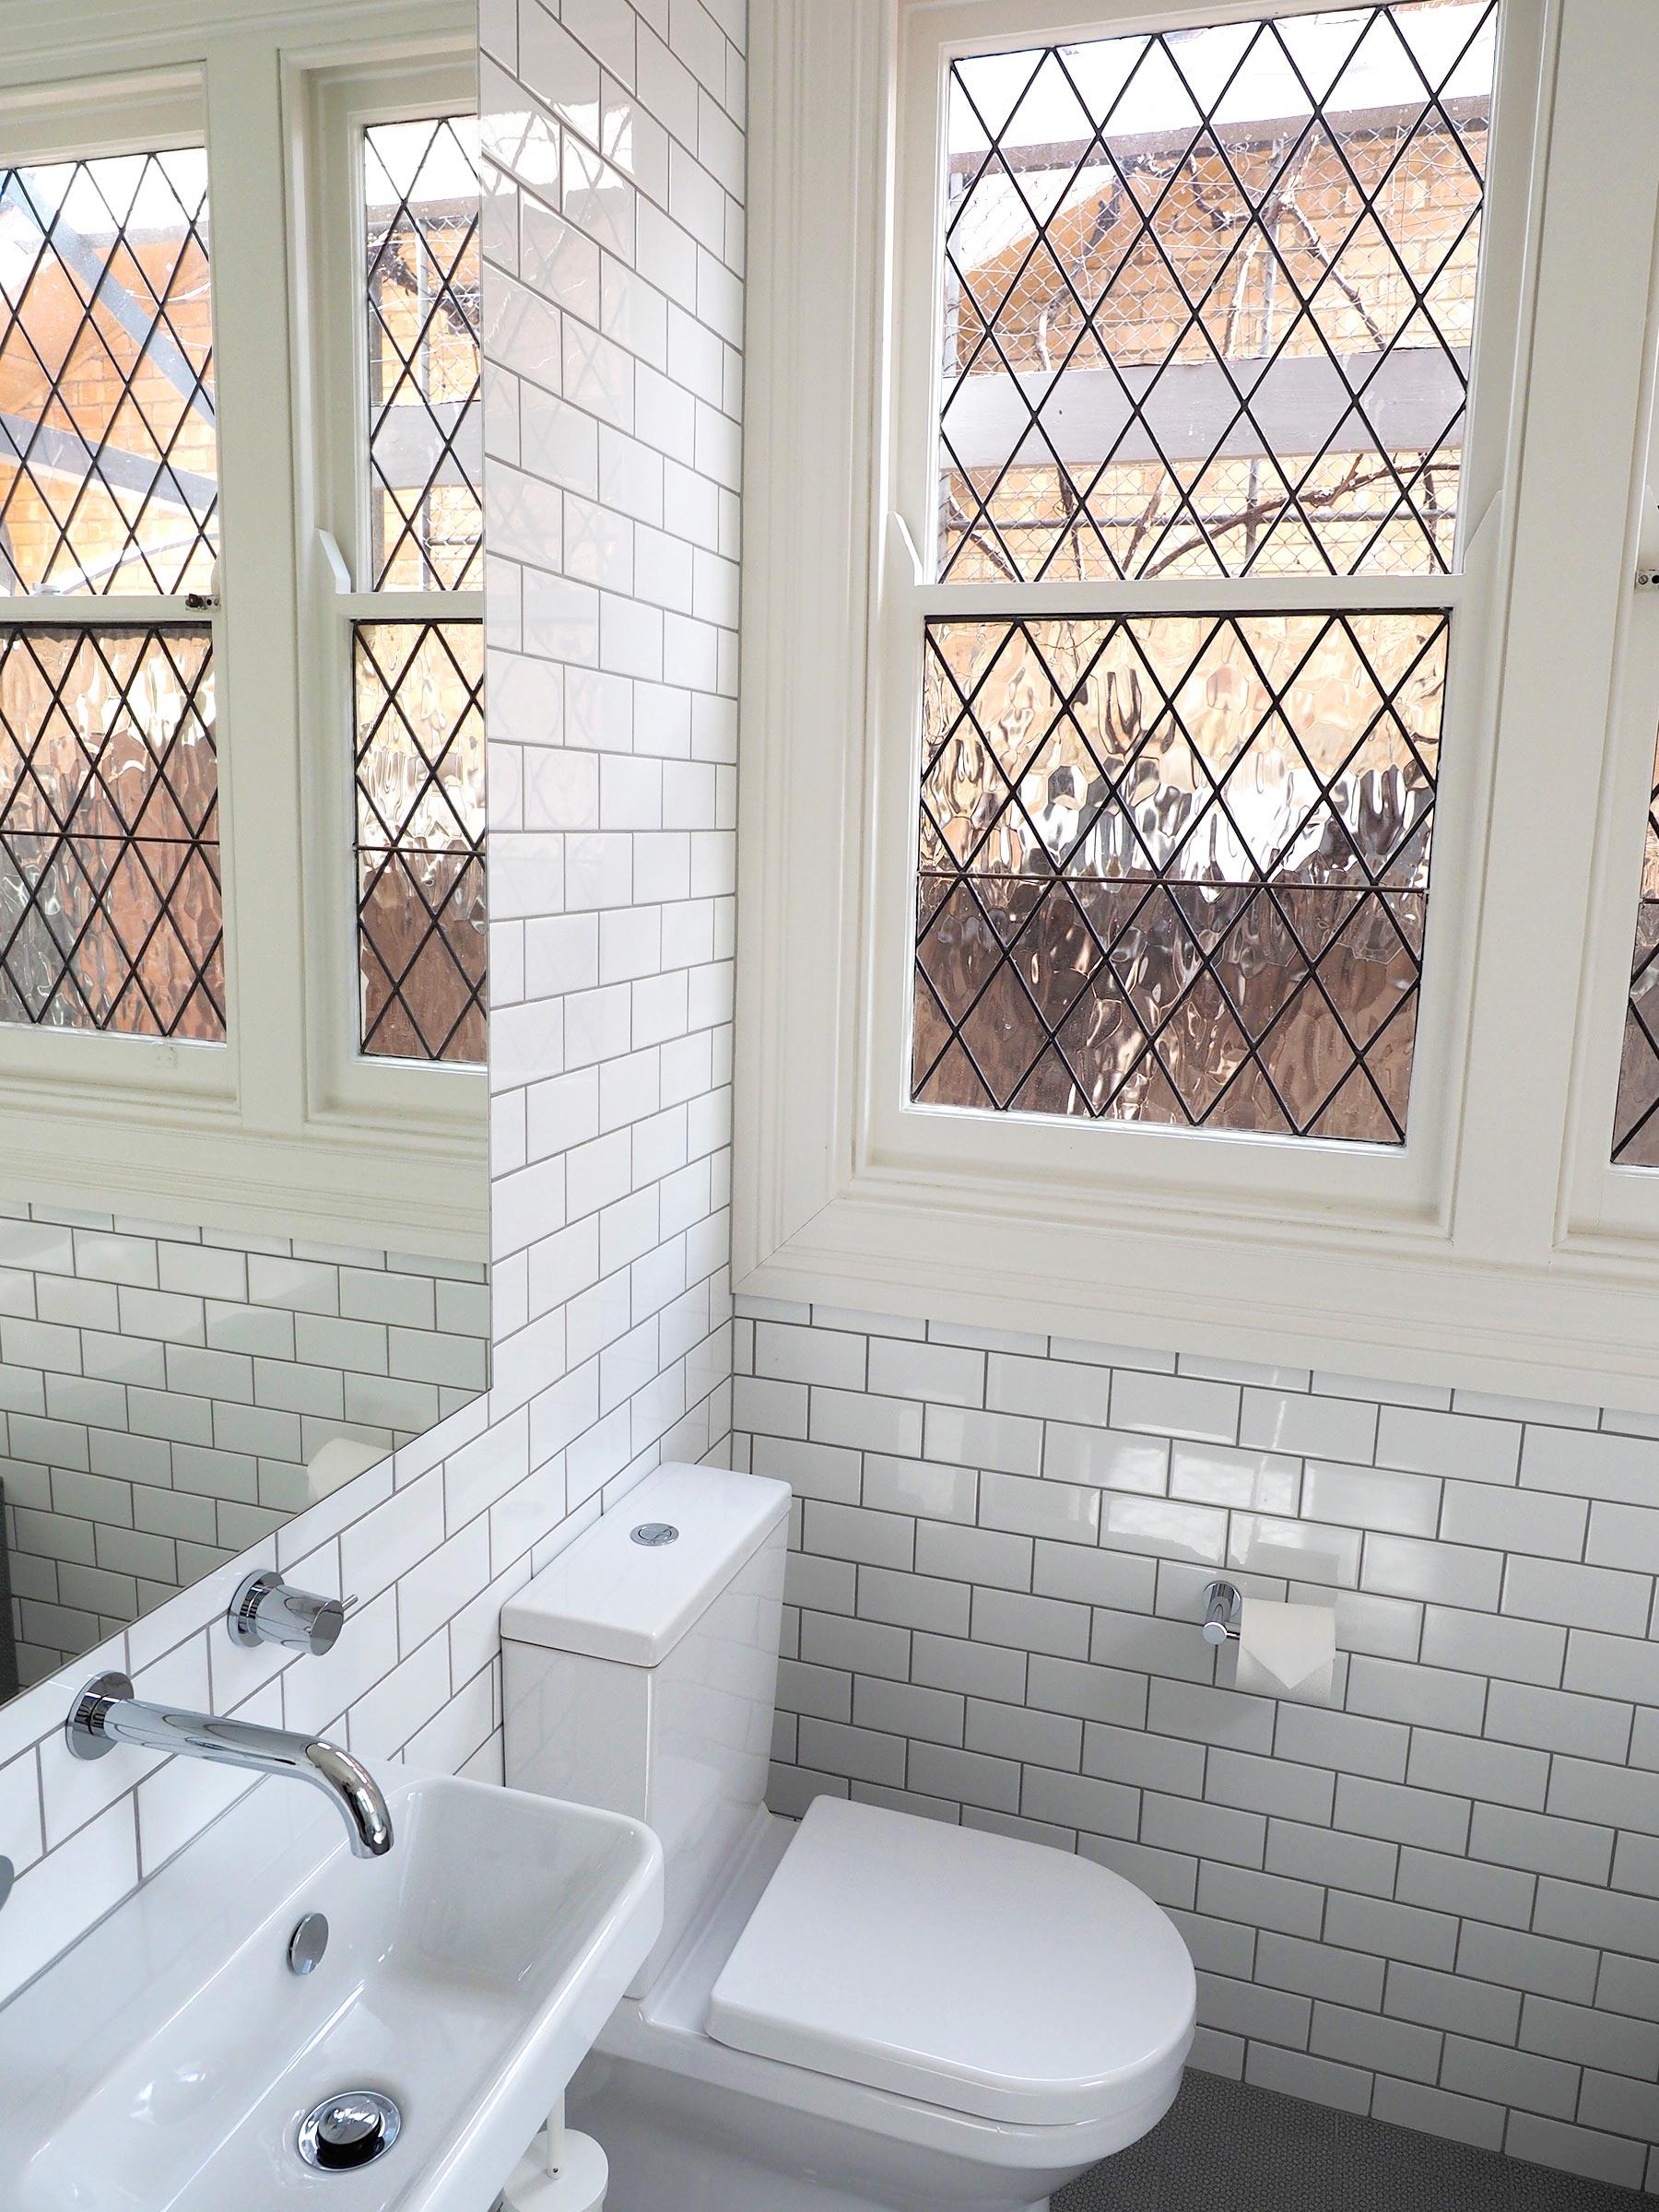 blue-fruit-interior-design-melbourne-guest-bathroom-edwardian-garden-house.jpg